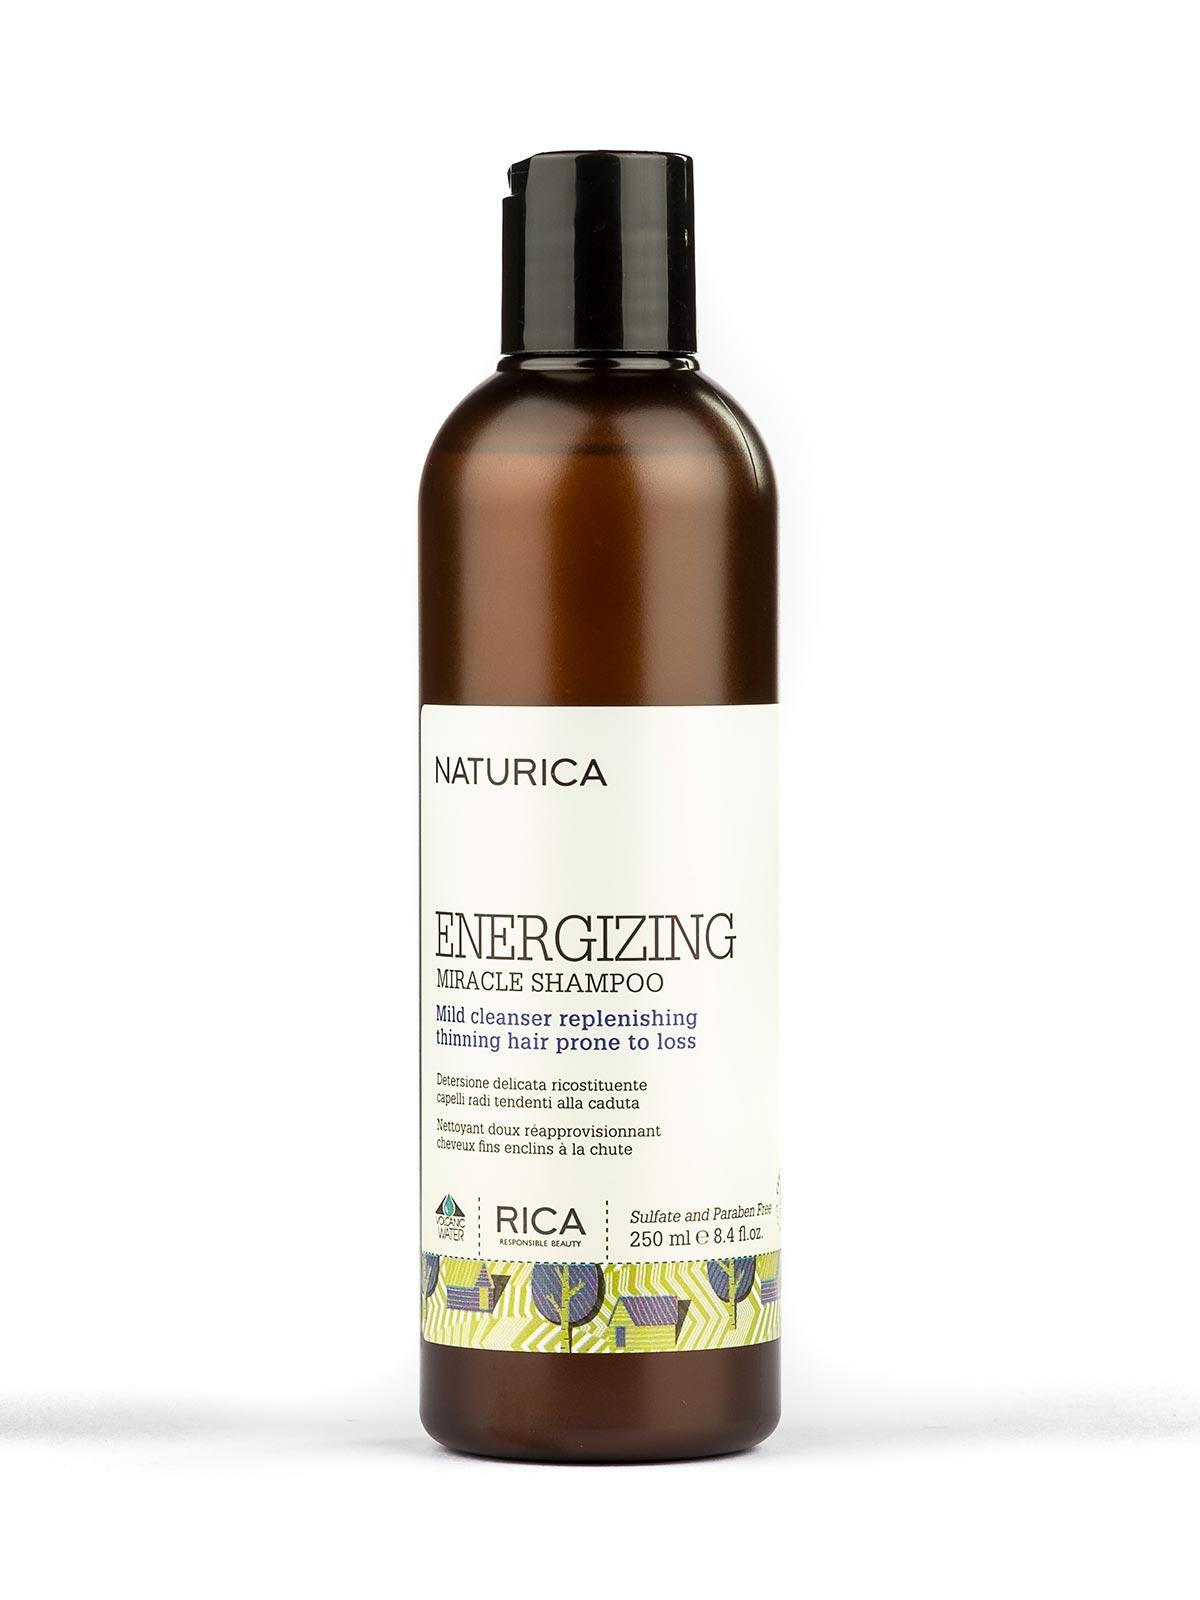 Rica Energizing Miracle Shampoo